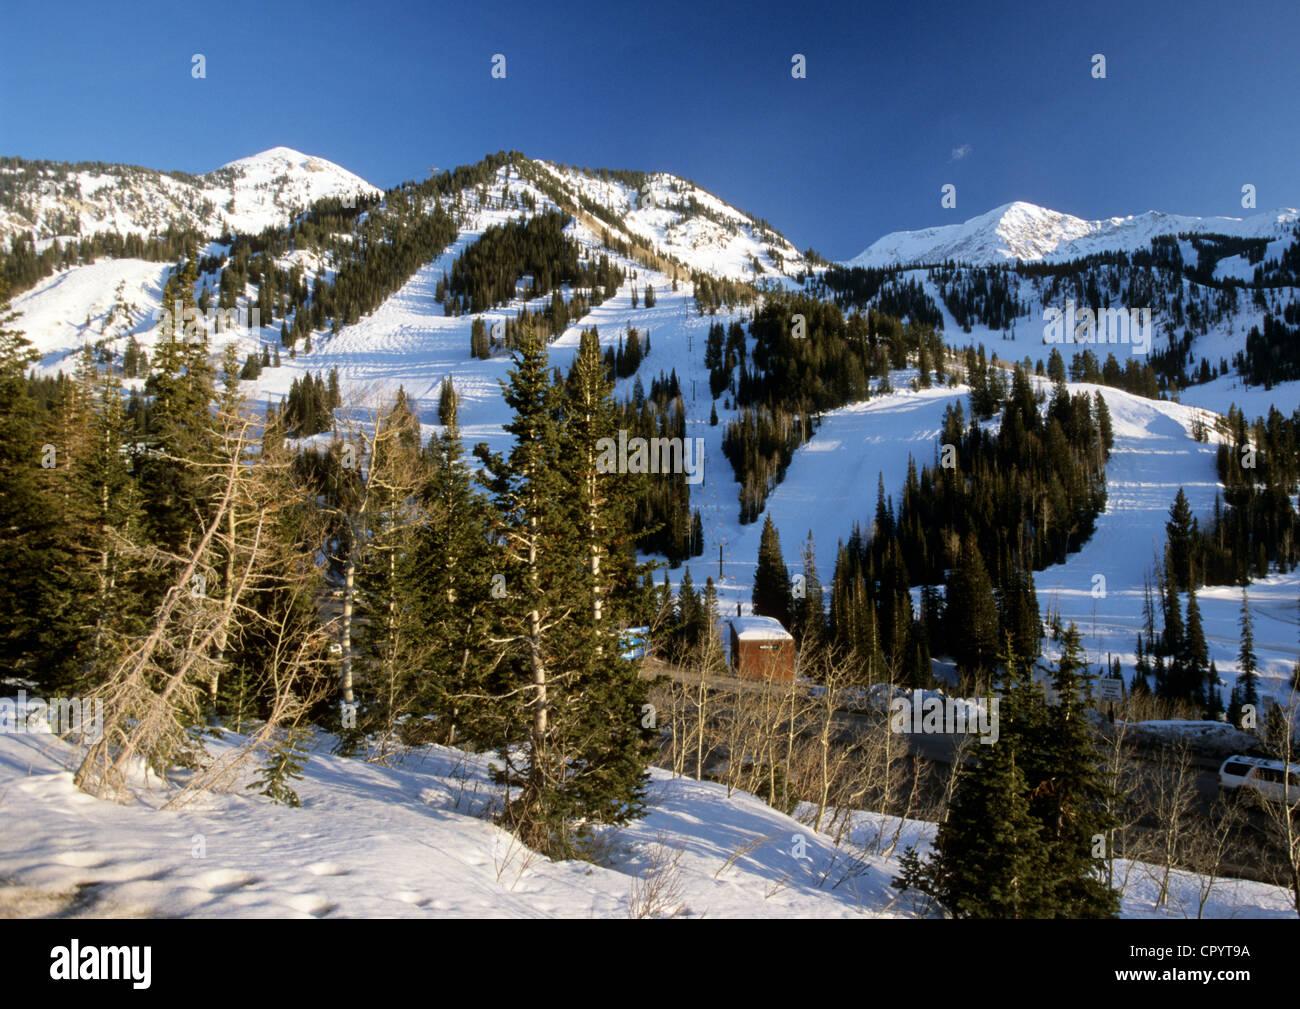 sundance mountain resort stock photos & sundance mountain resort